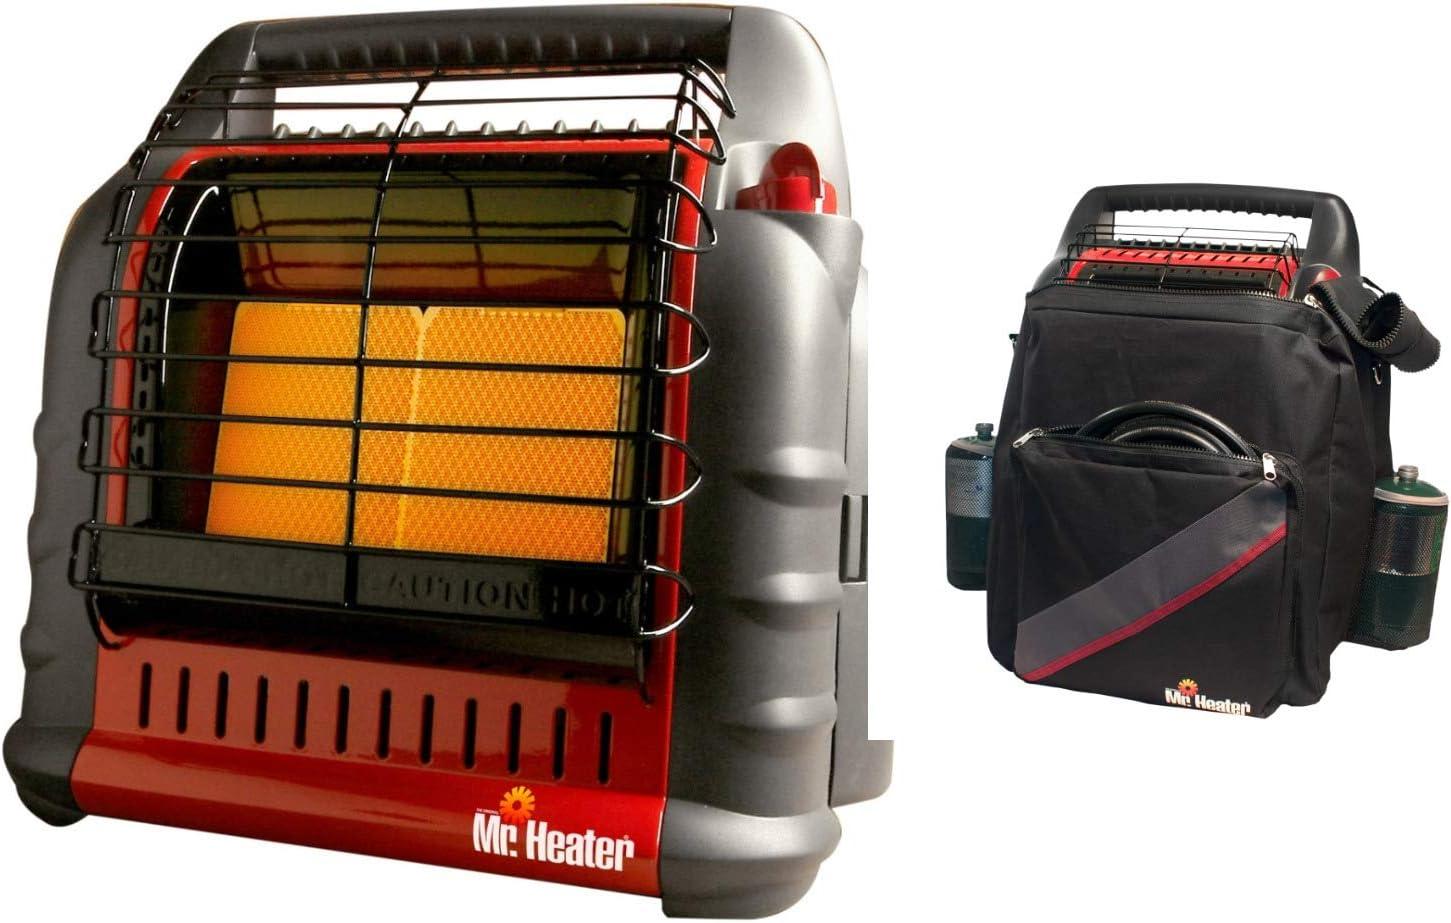 Heater Portable Big Buddy Propane Heater Mr